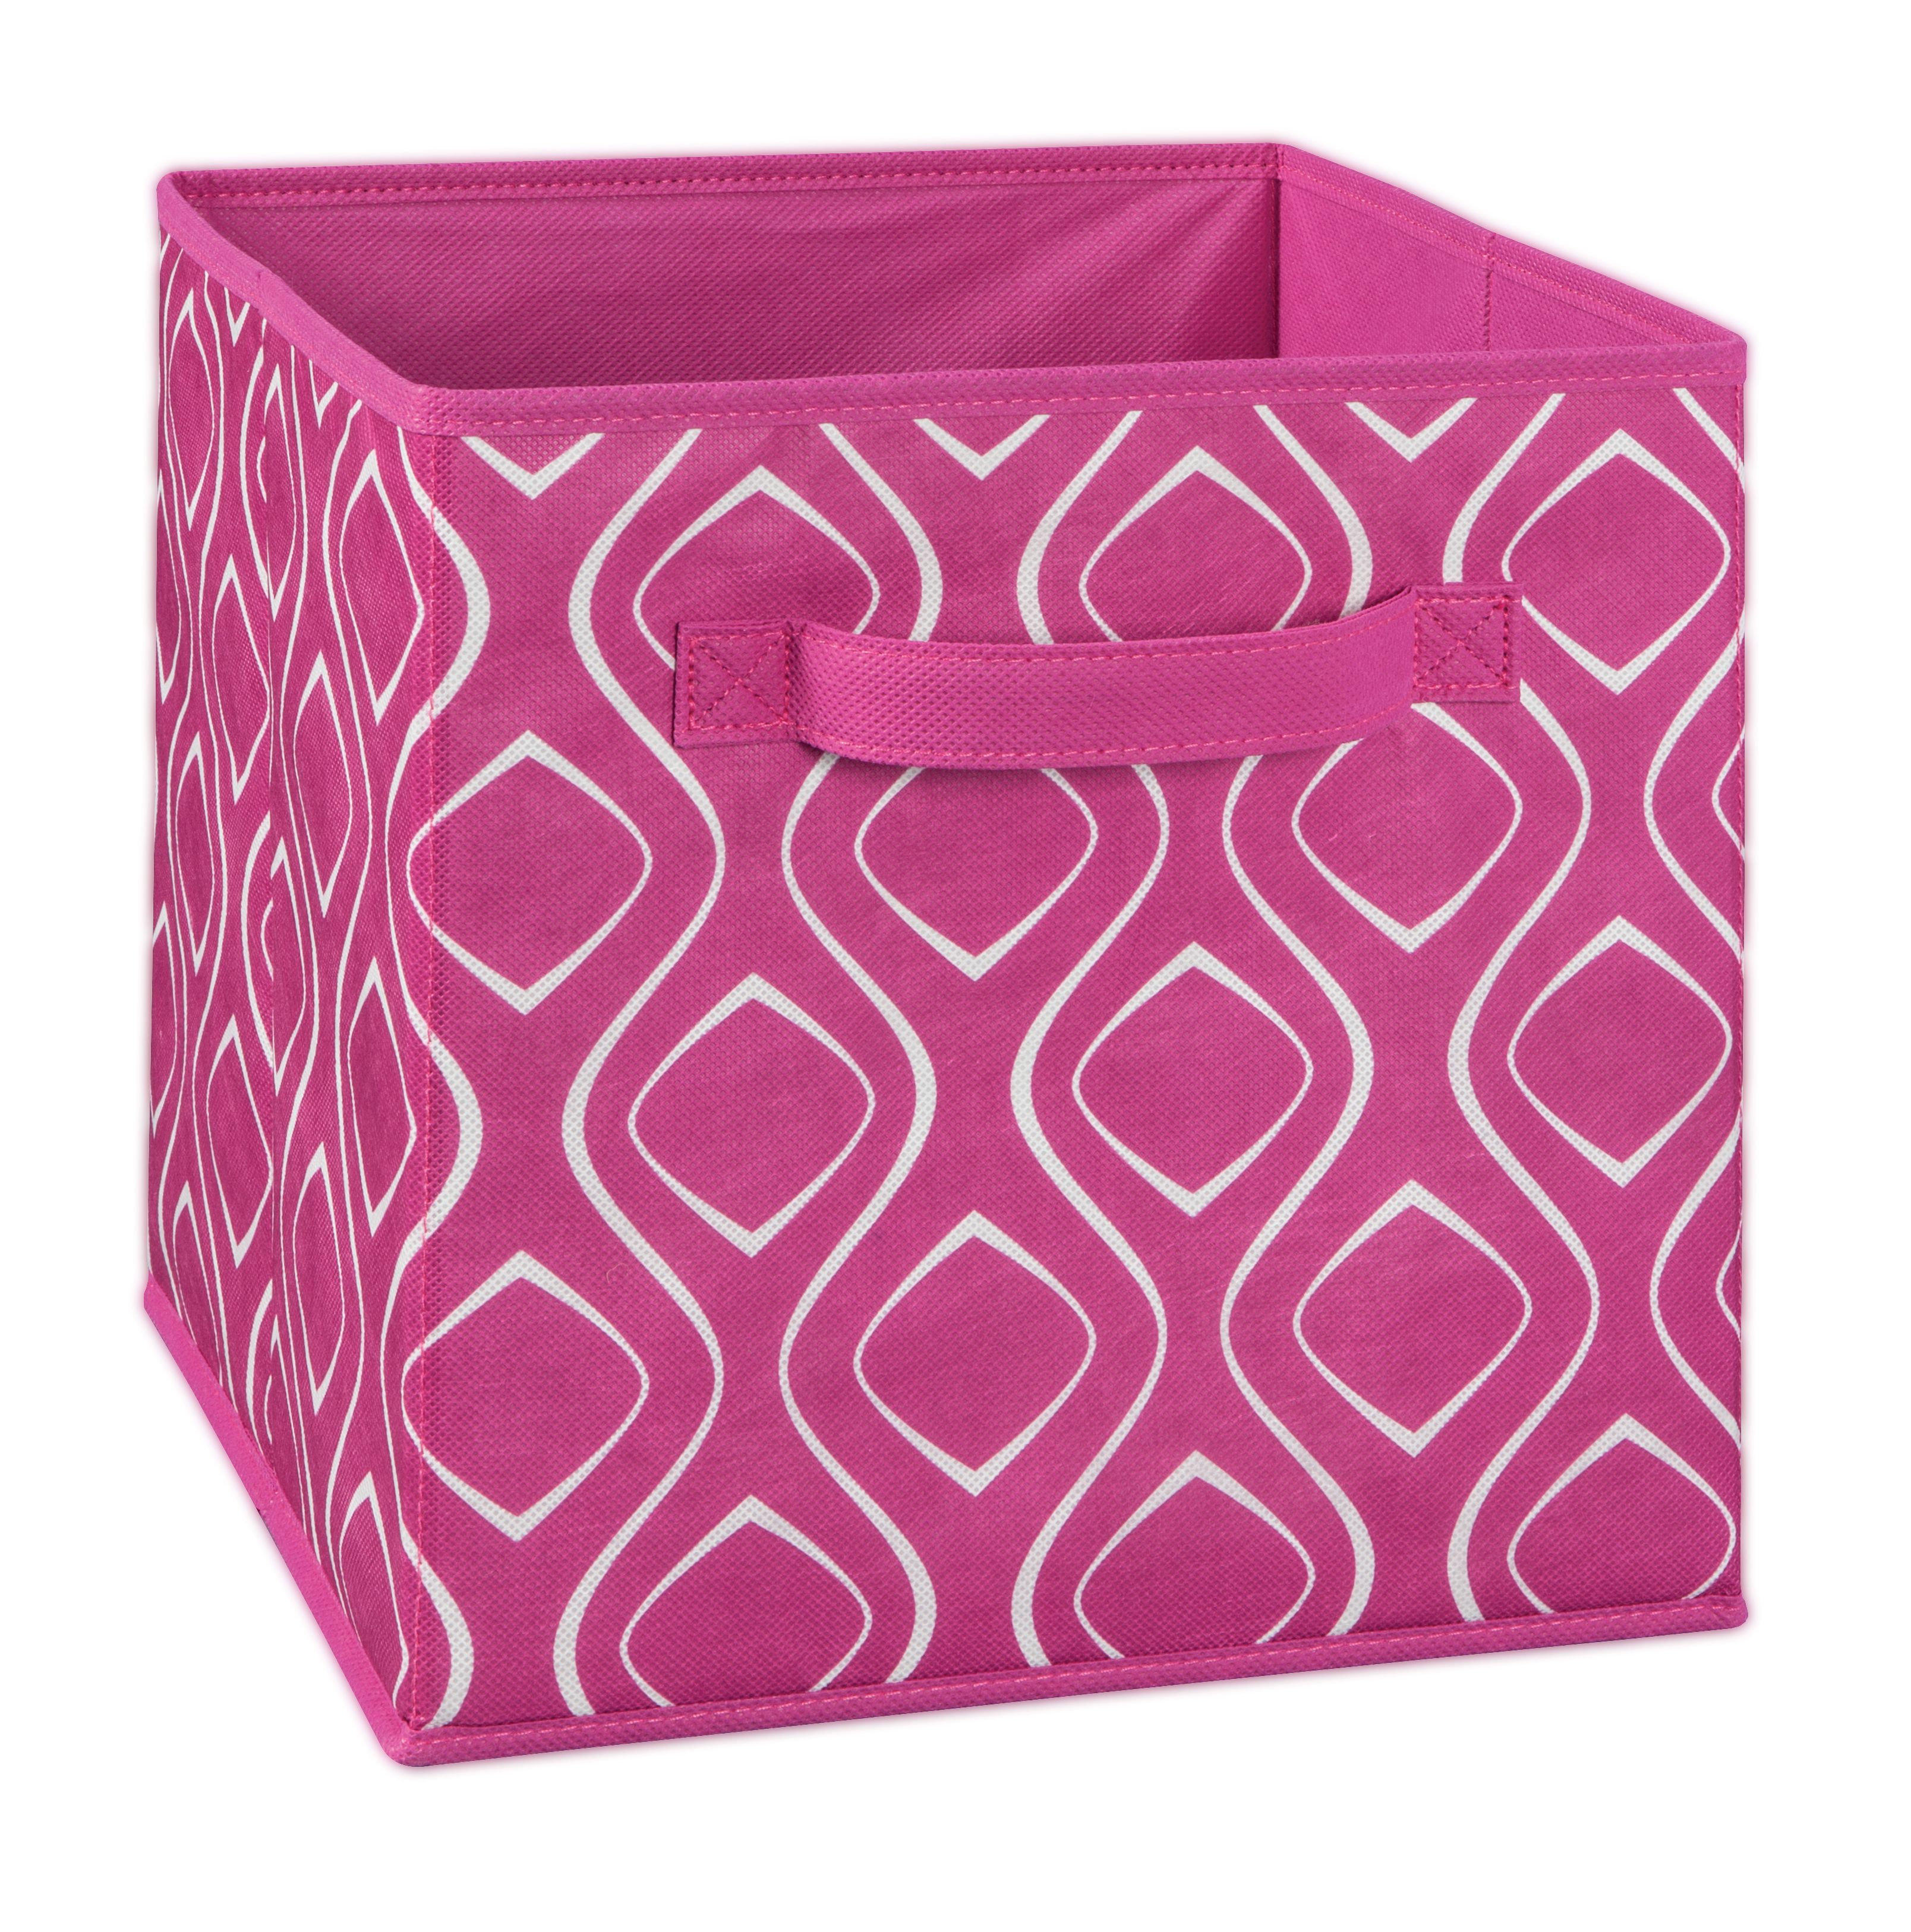 Closetmaid Fabric Drawer Fabric Drawers Printing On Fabric